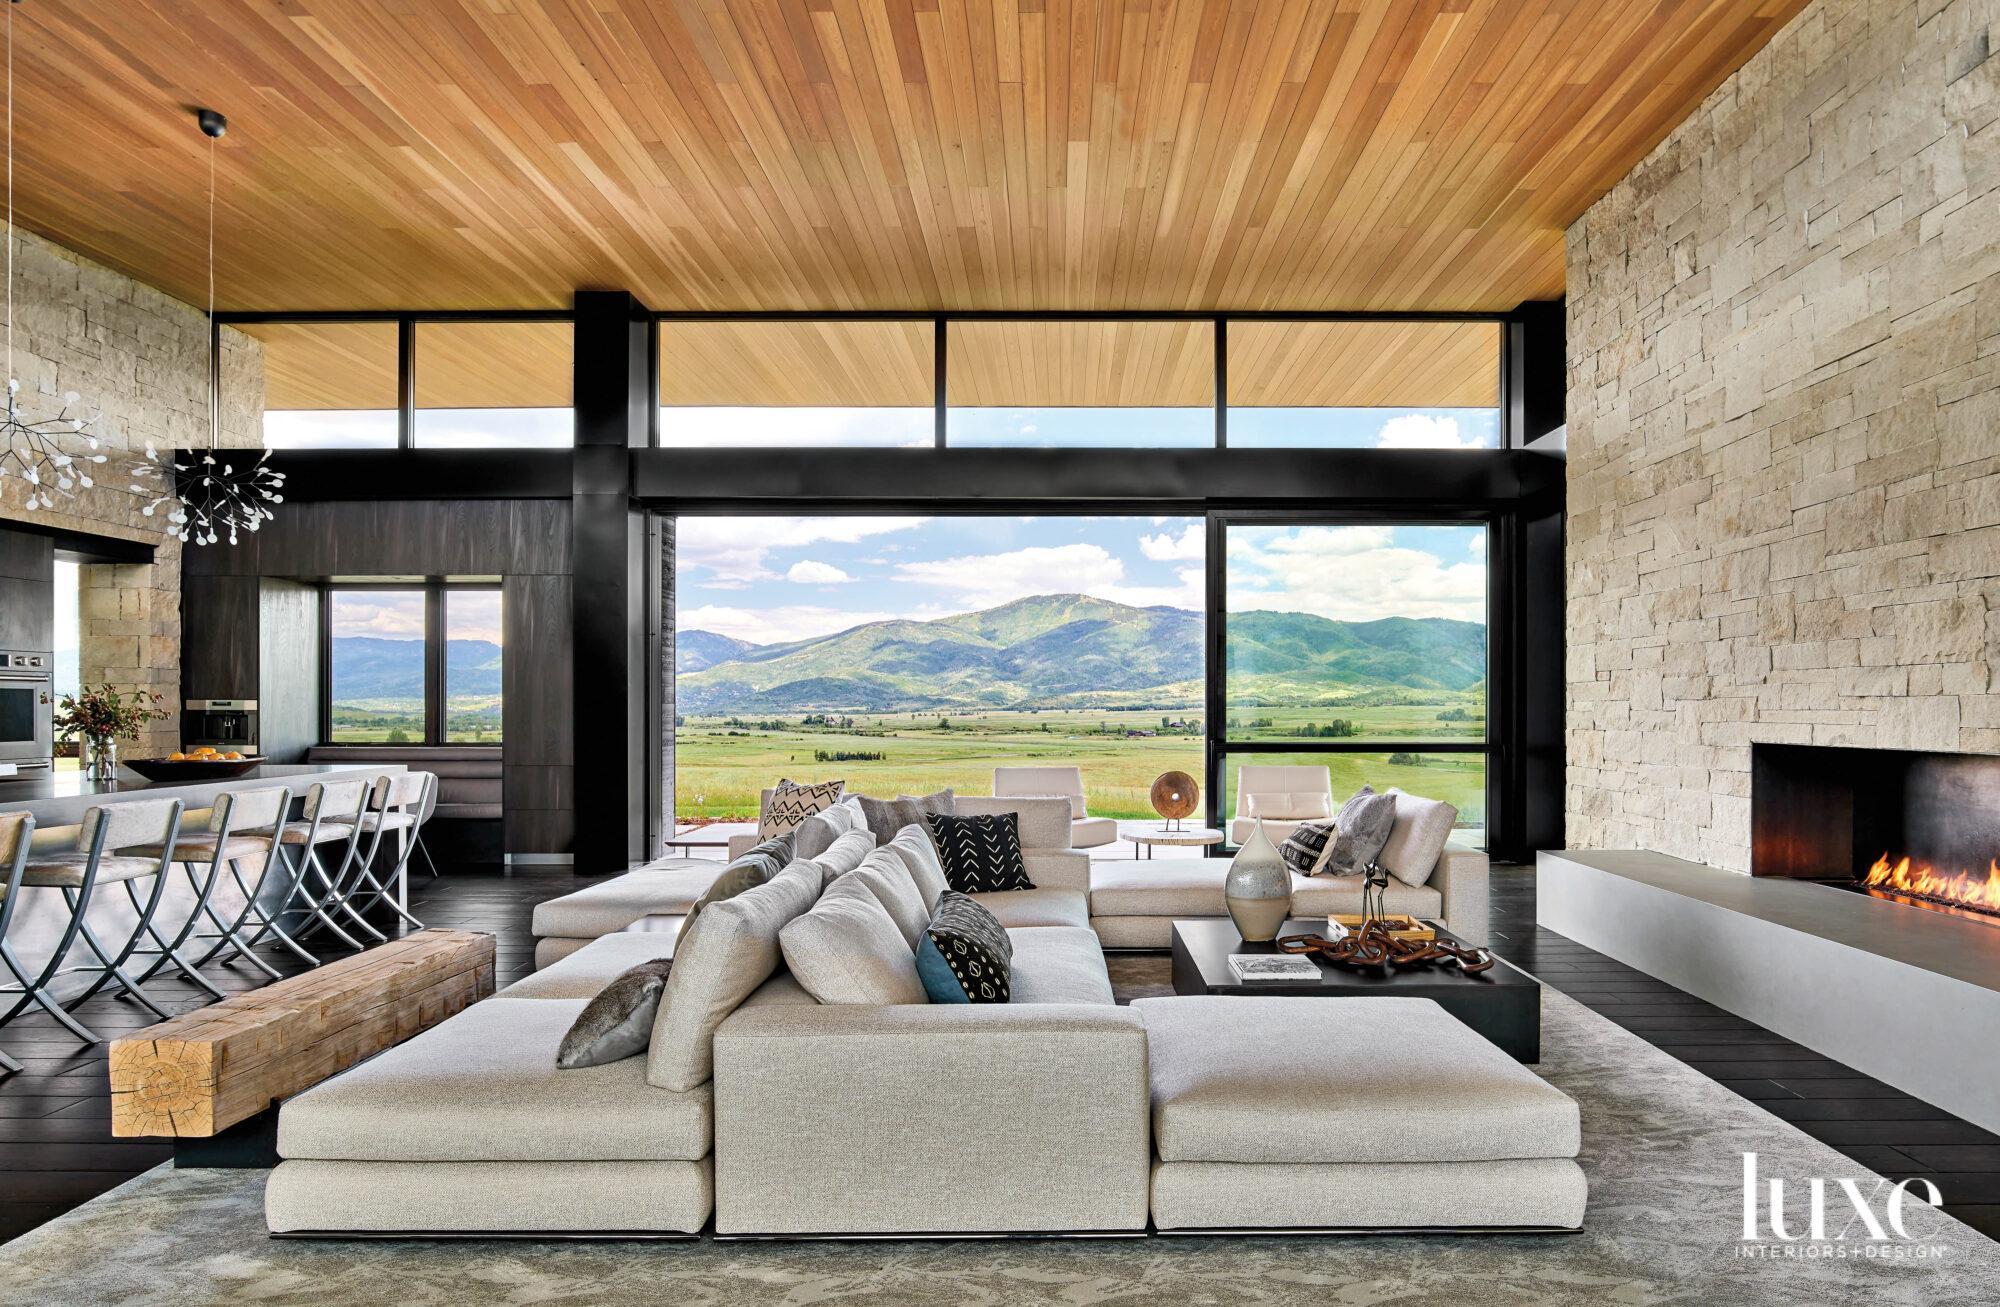 Tan modular sofa faces the...